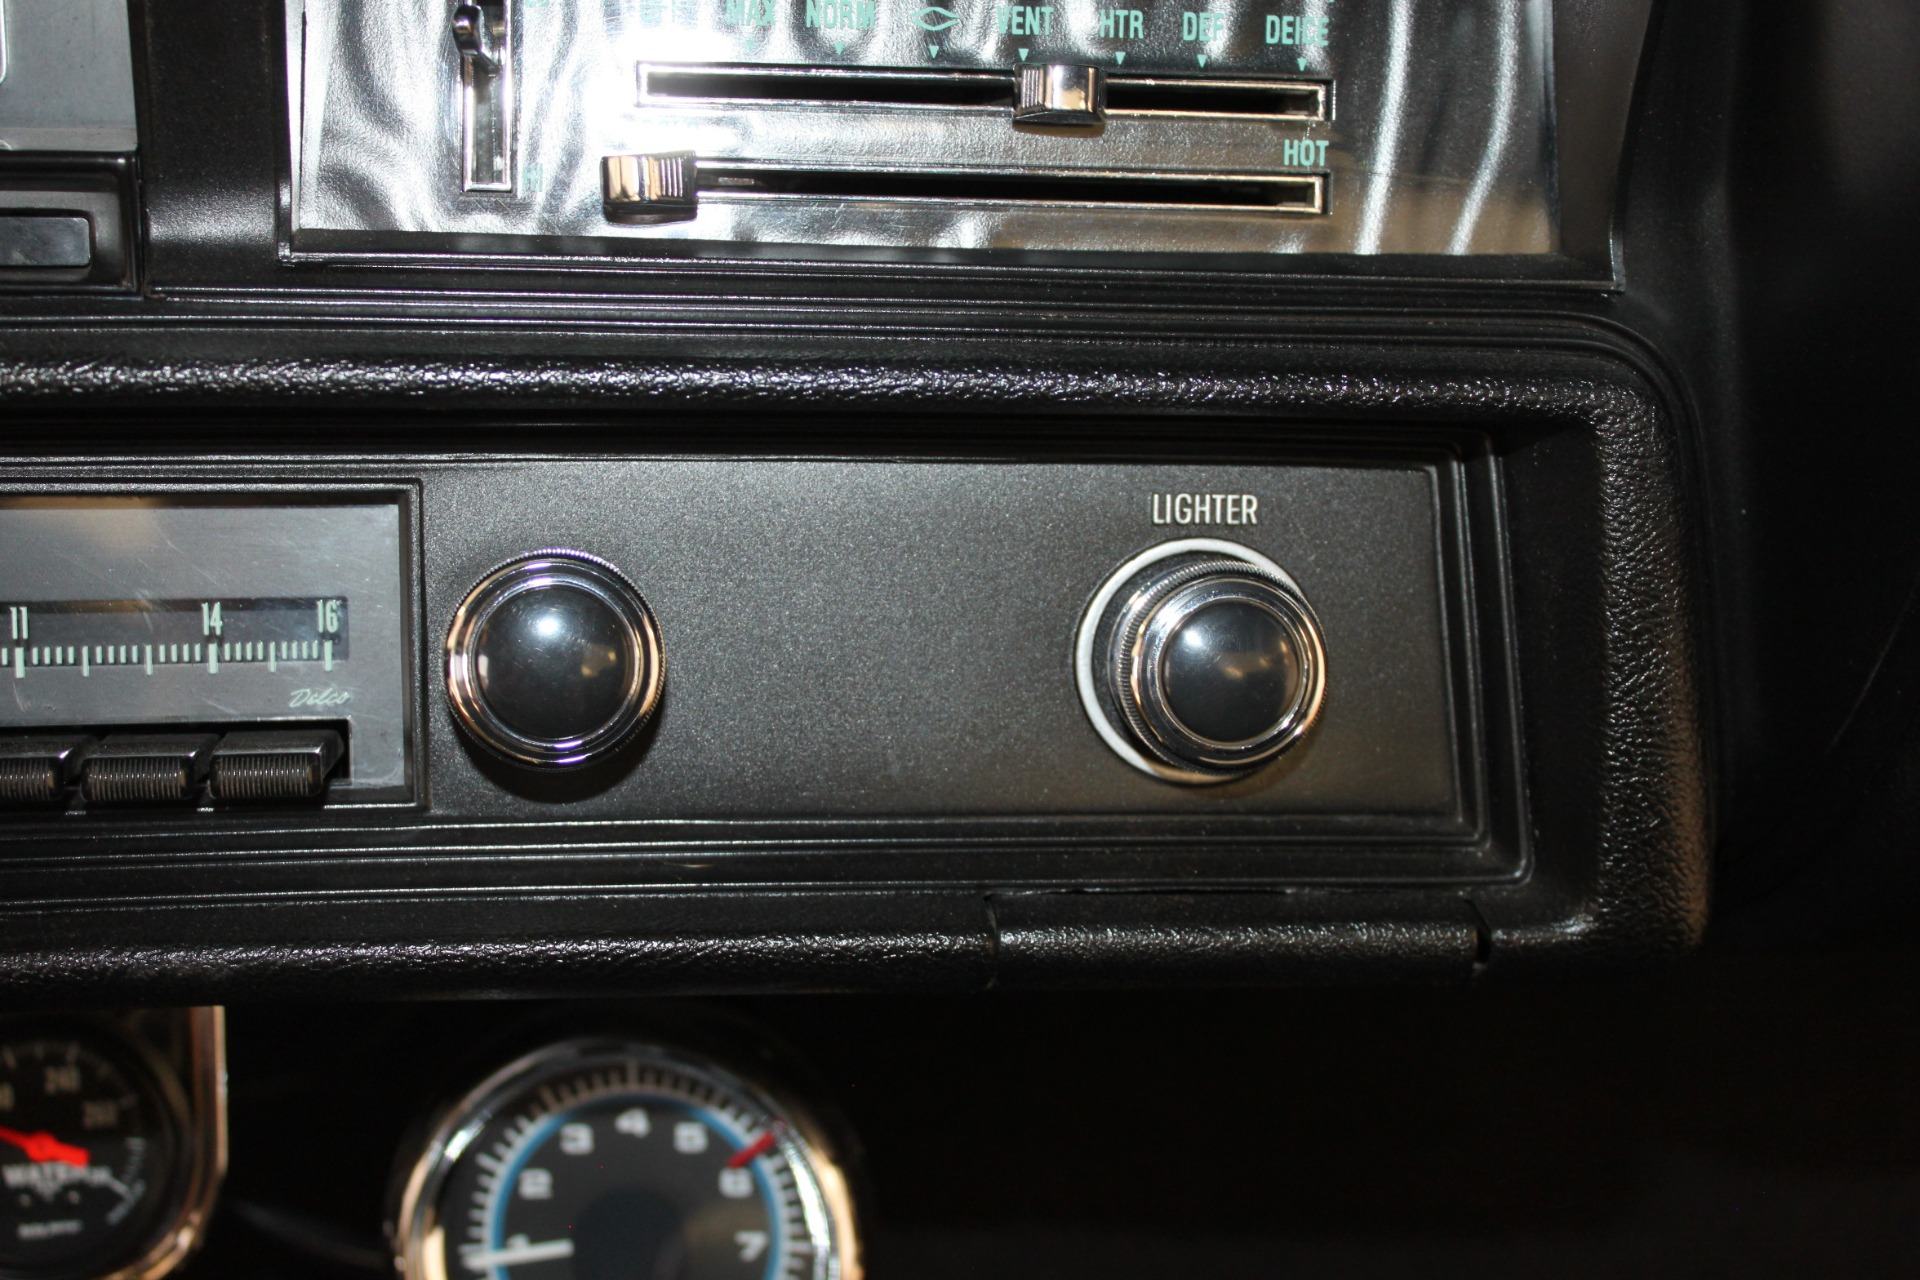 Used-1970-Chevrolet-El-Camino-Custom-350-ci-Mercedes-Benz